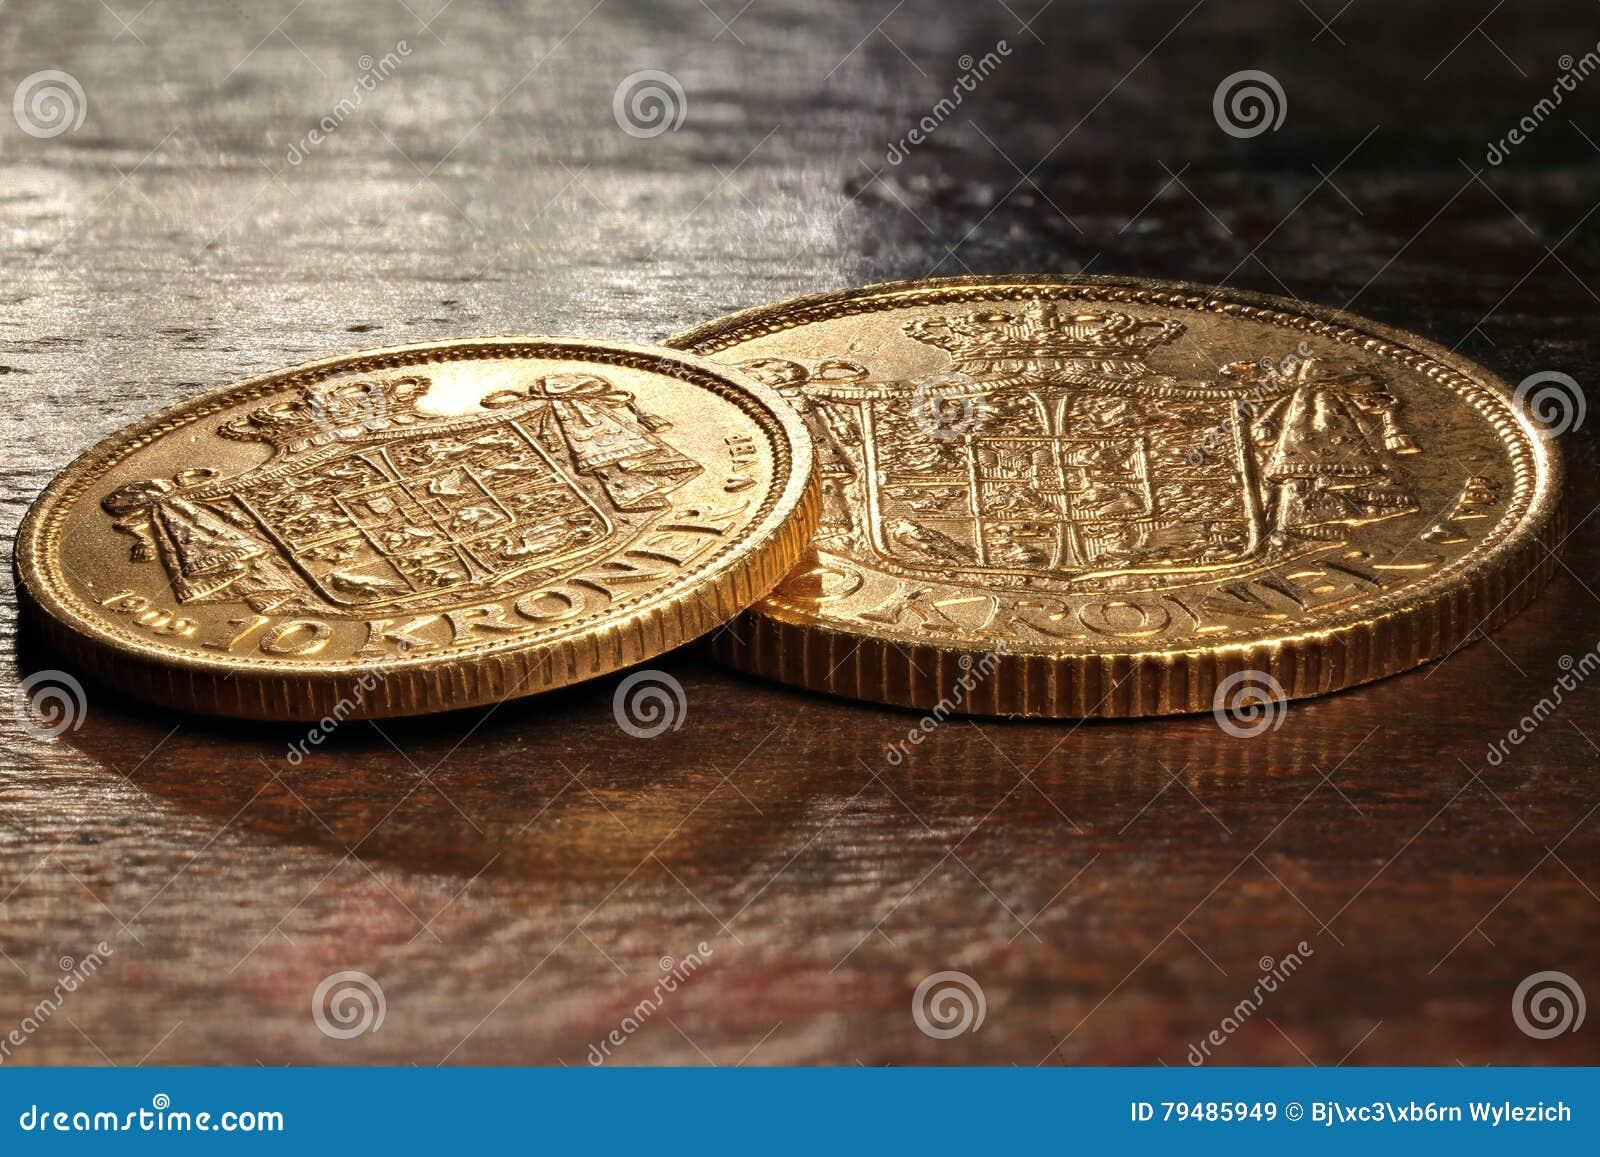 Monedas de oro danesas